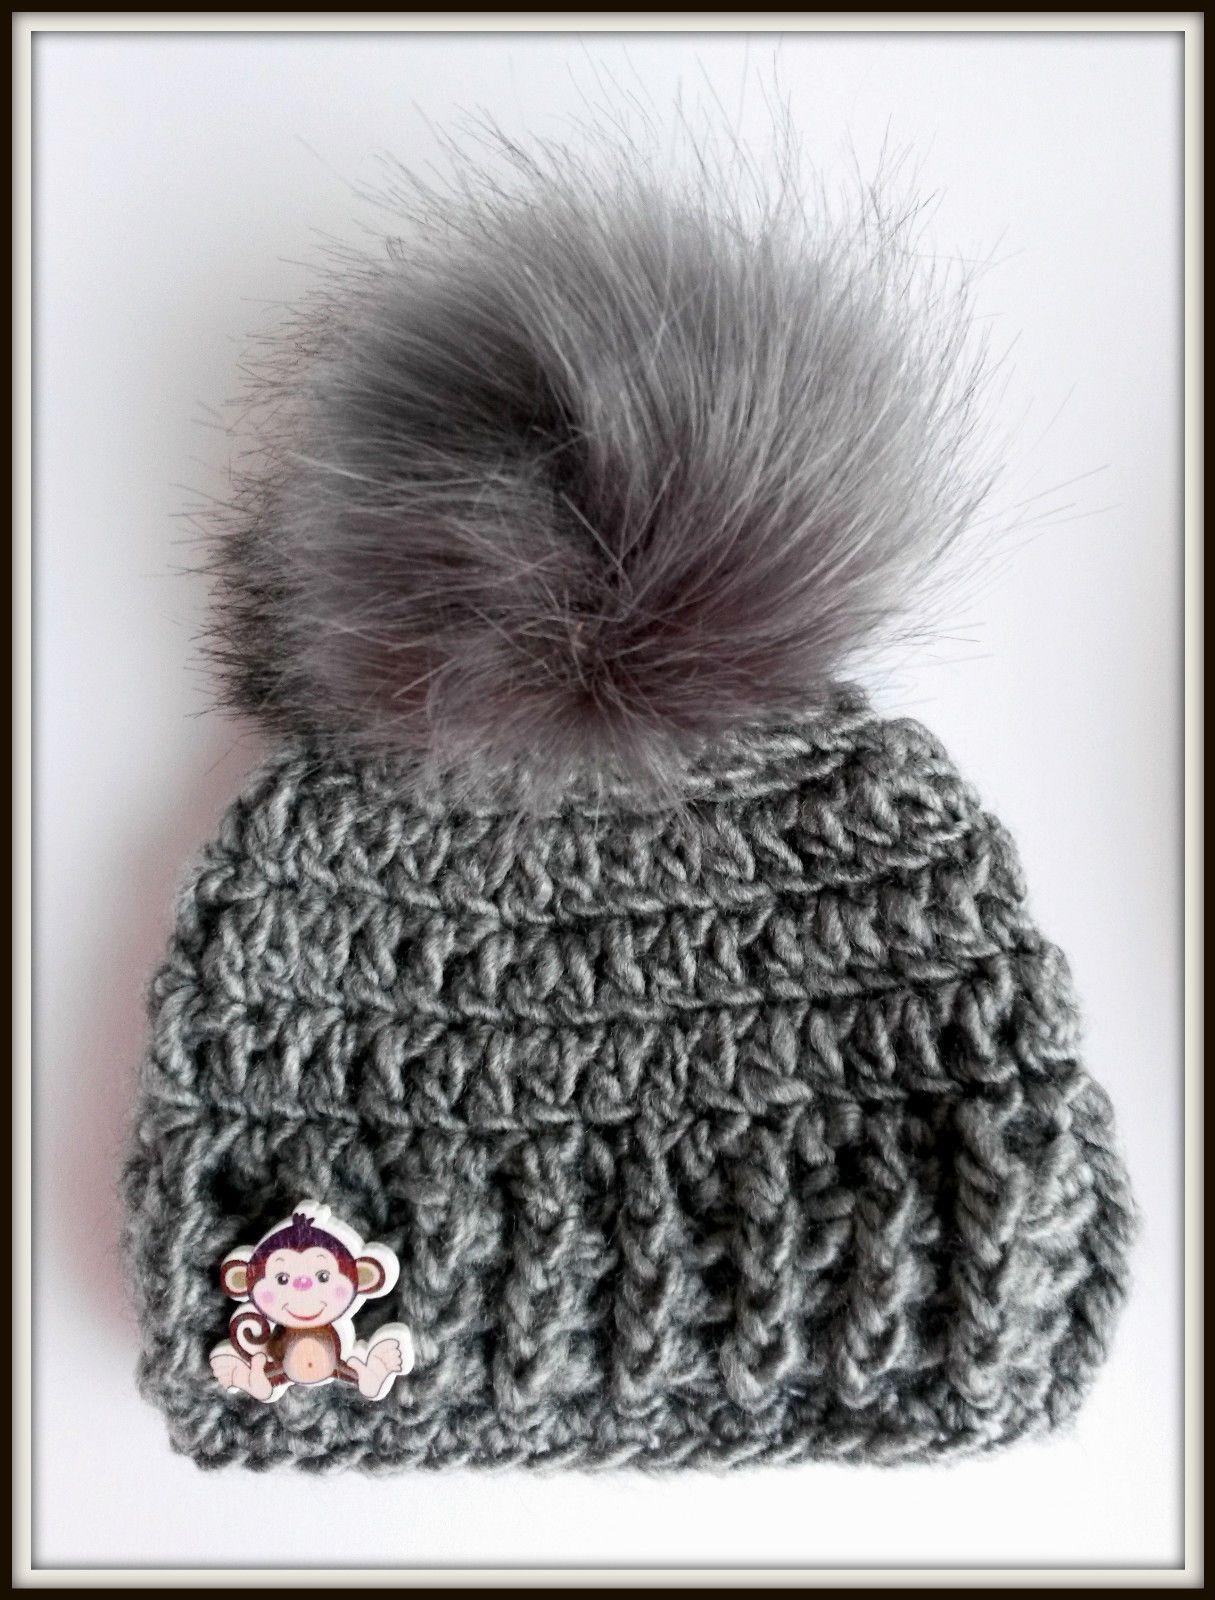 d5b1957a3e6 Handmade Little Monkey fur pom pom baby photo prop Hat size newborn 0-3  months